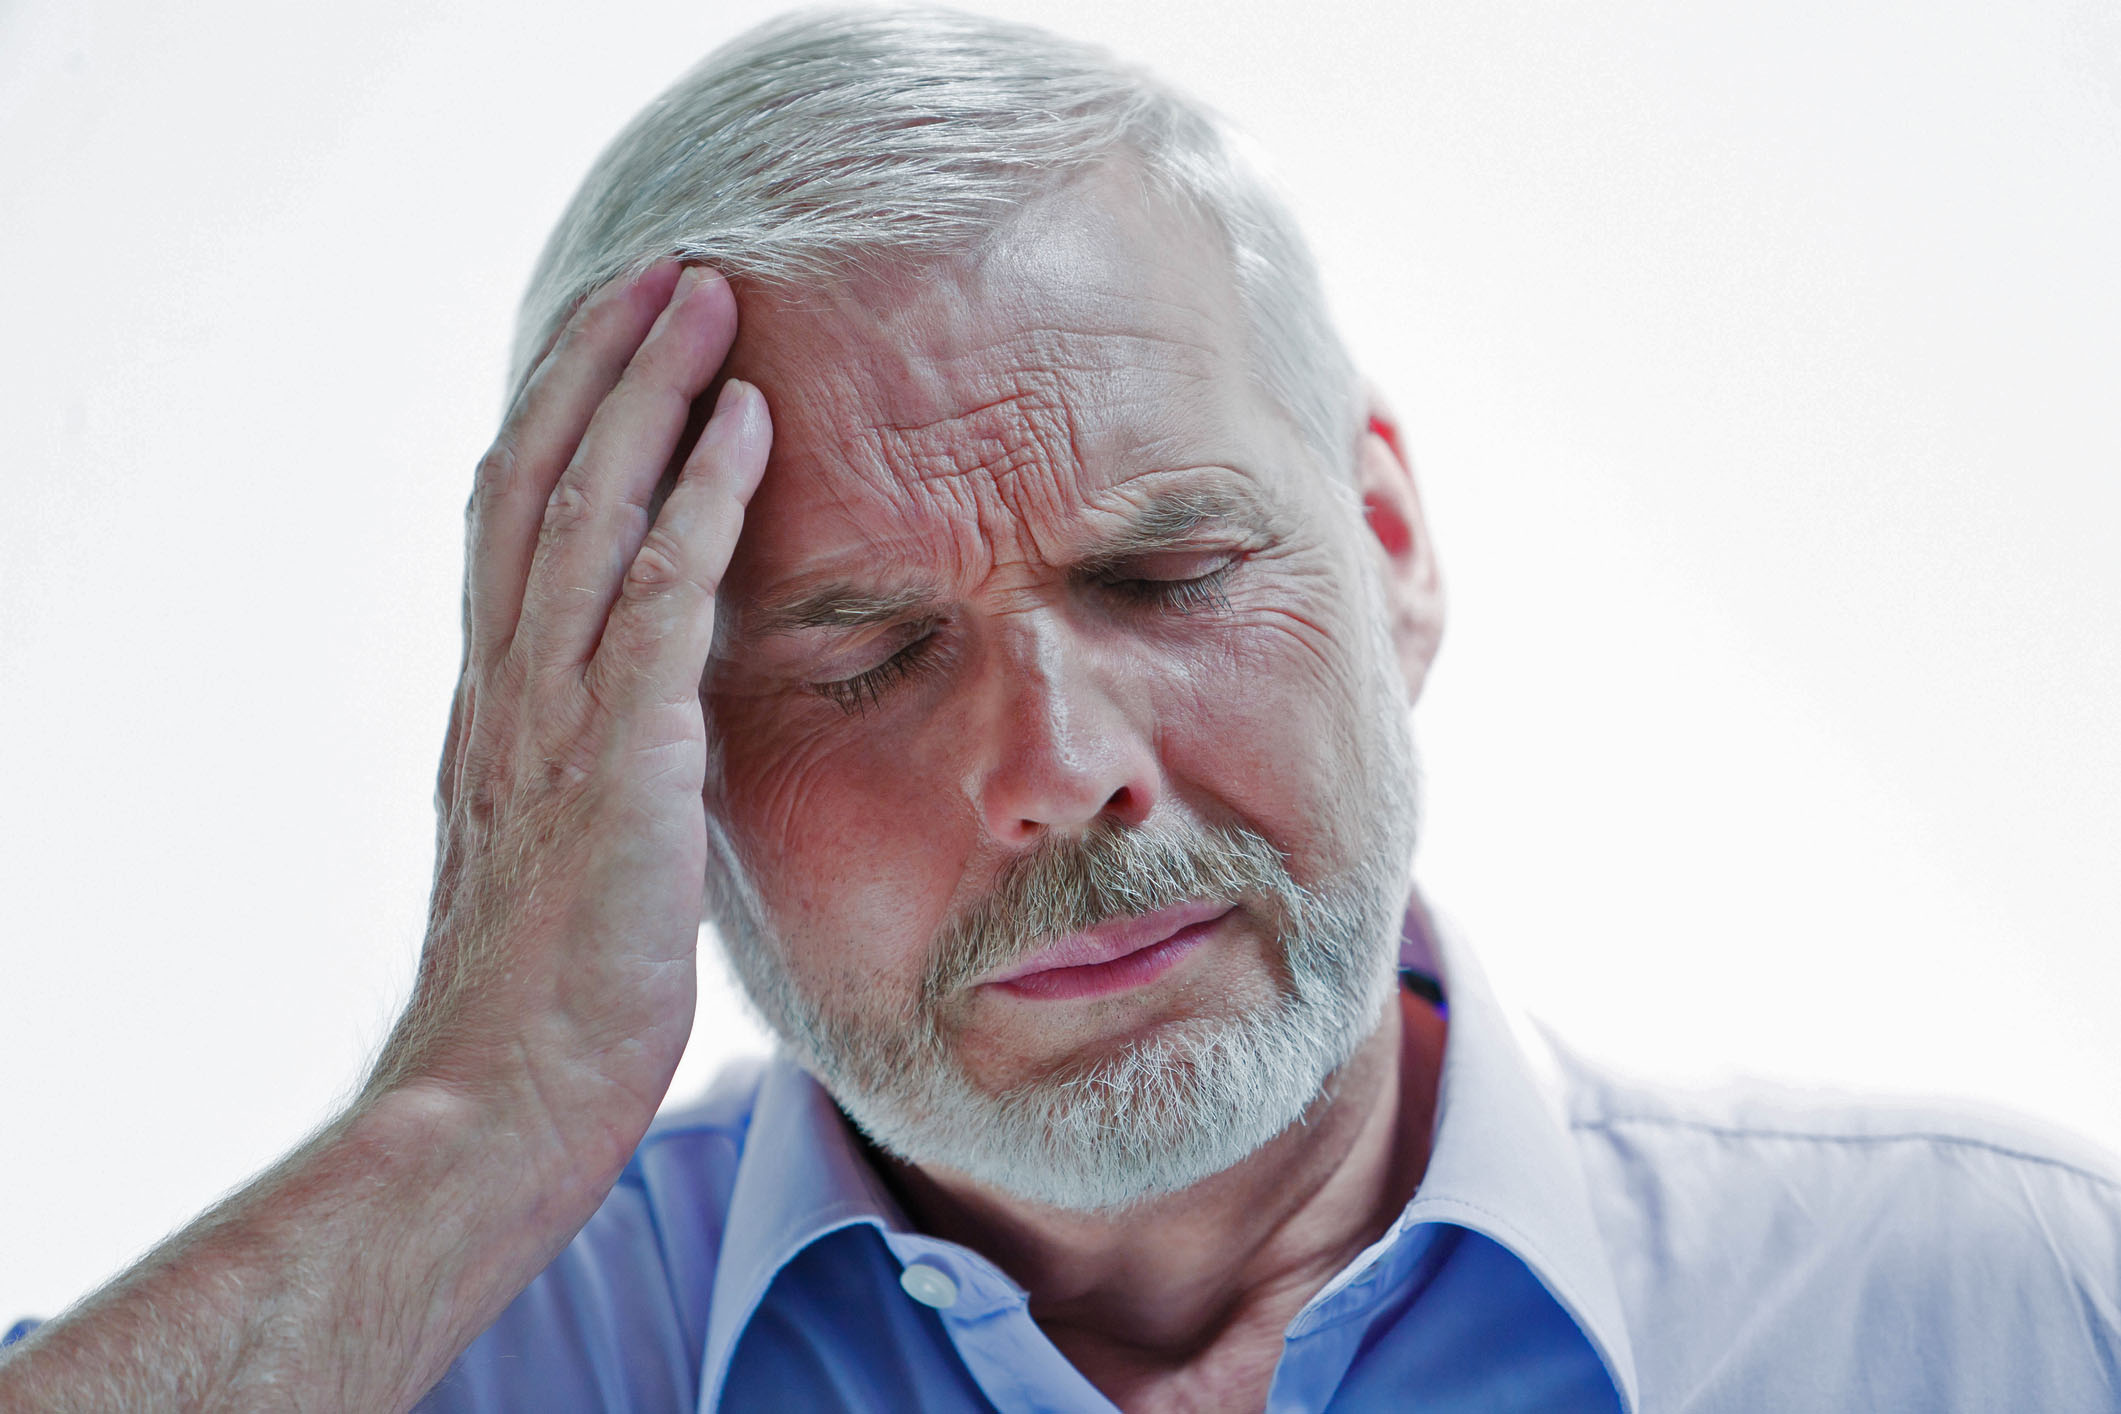 Man suffering with a Migraine headache